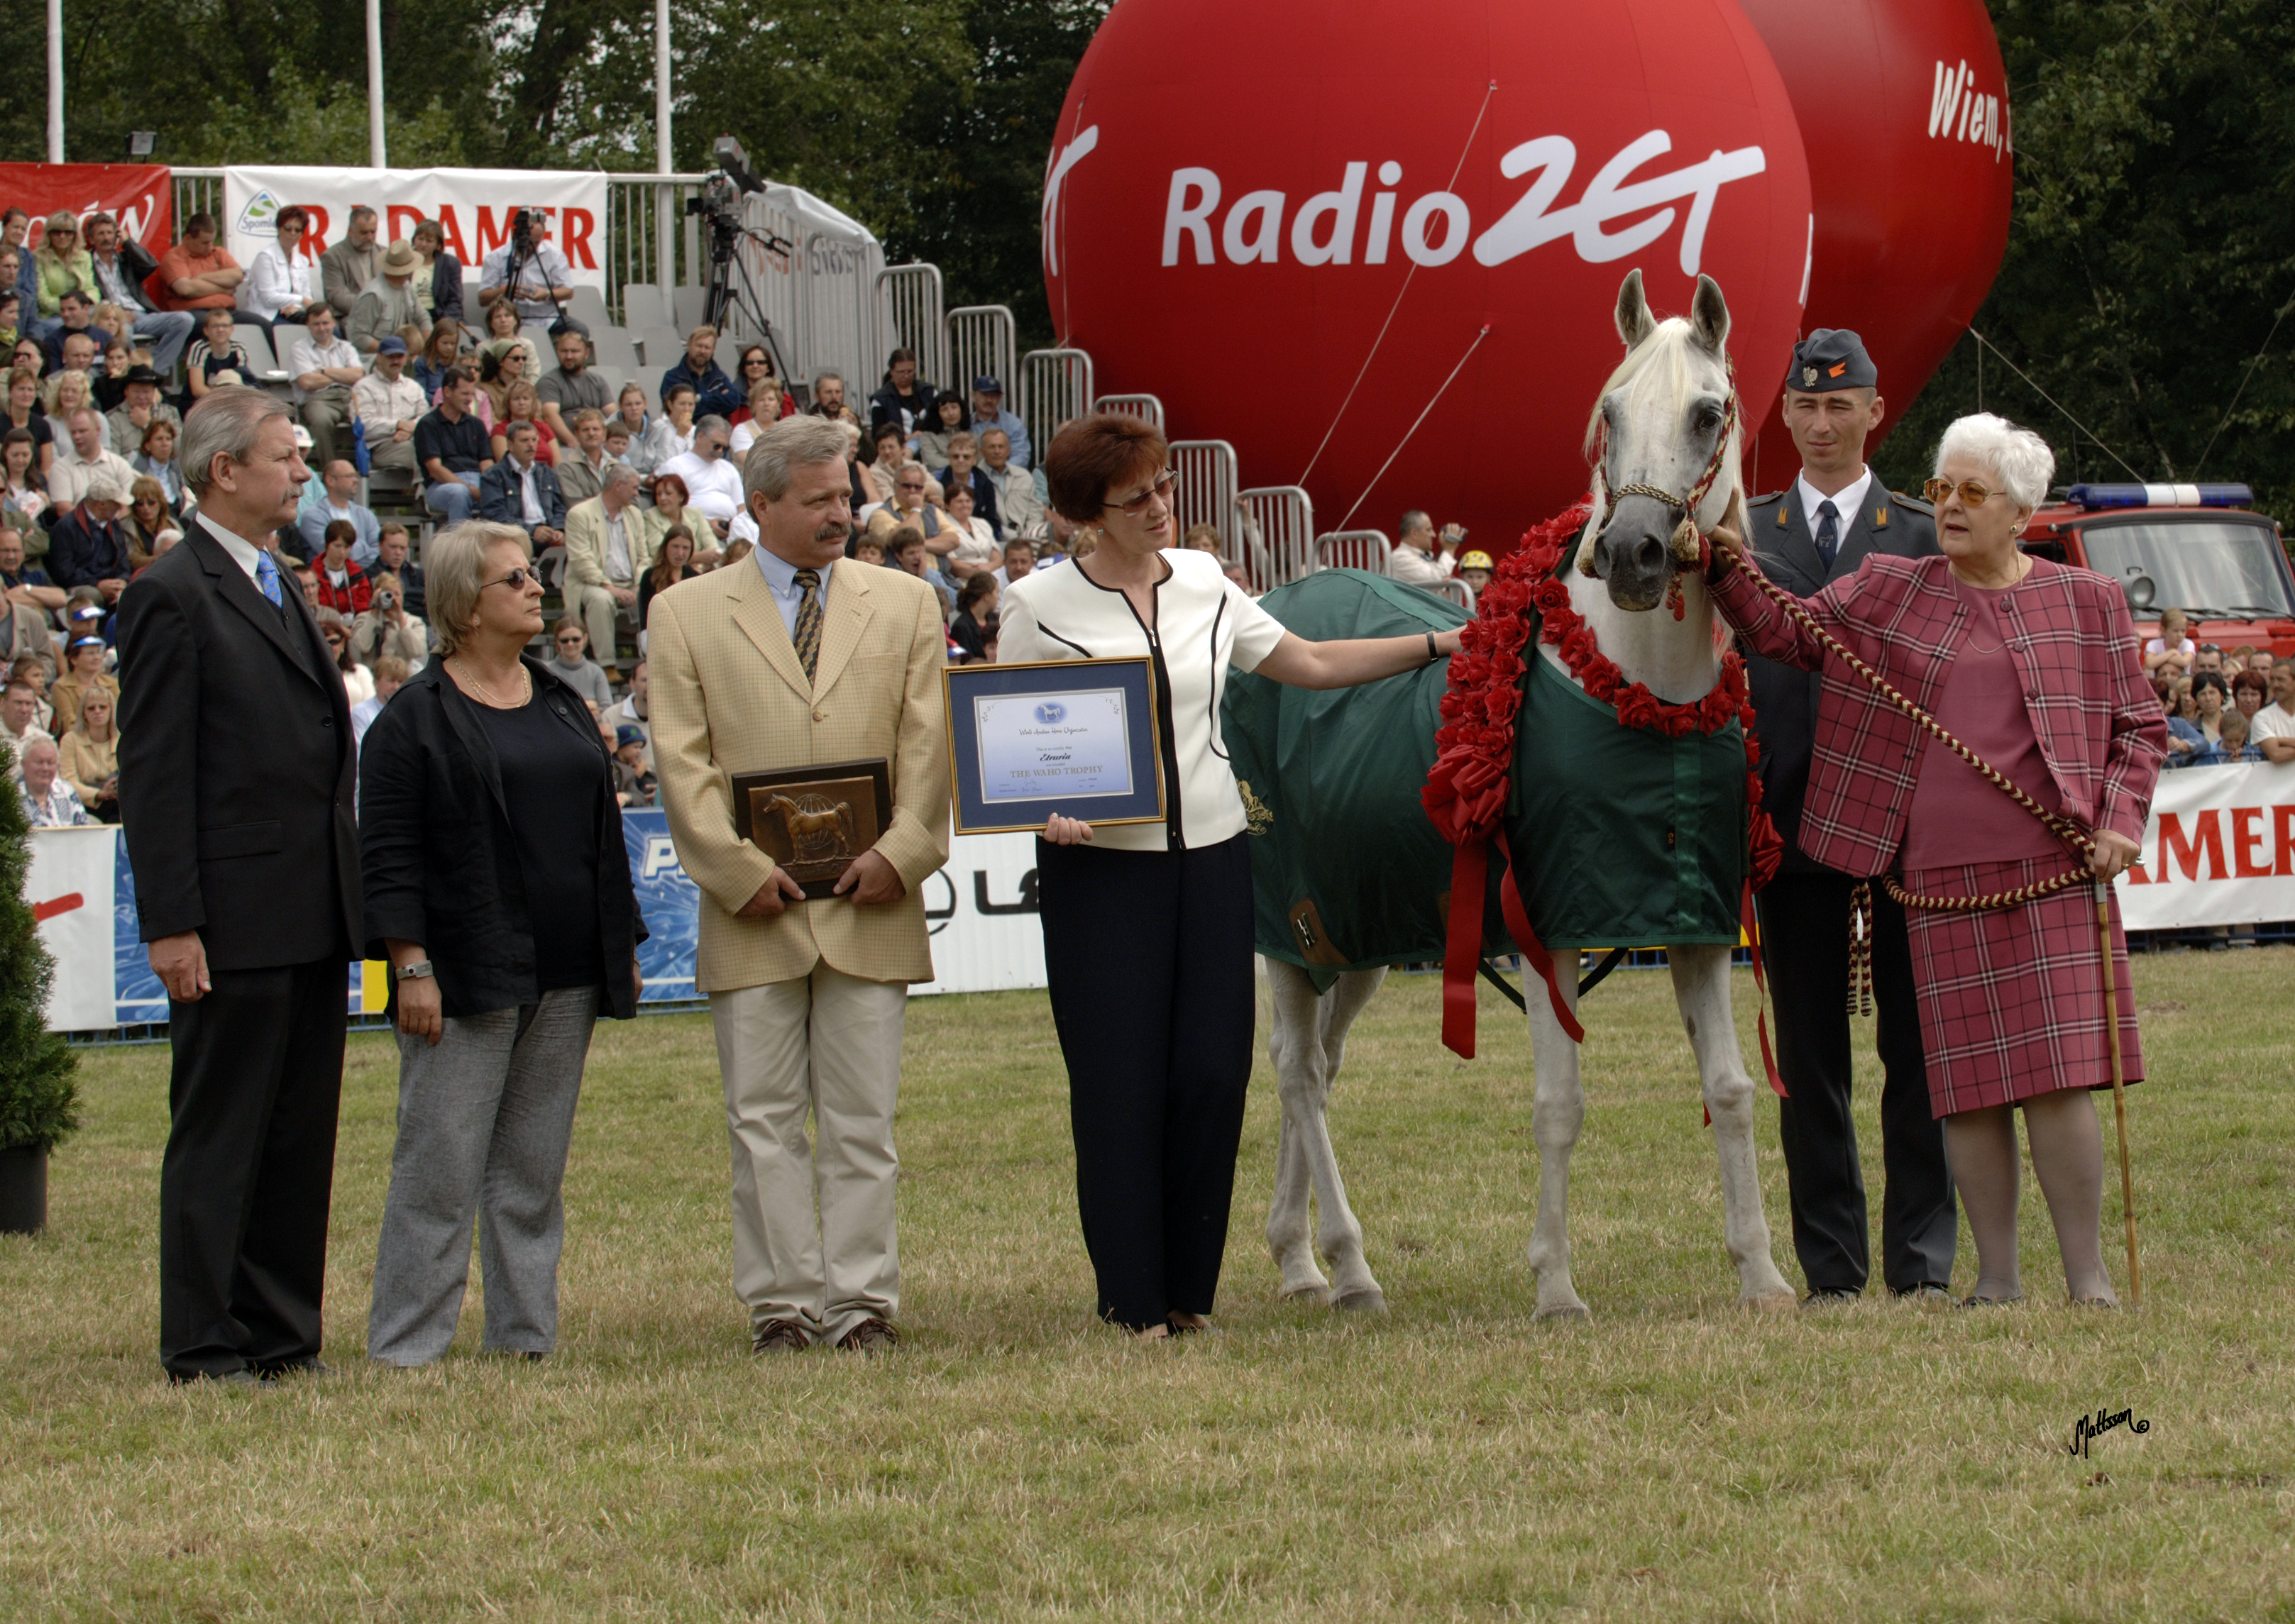 Etruria in 2005 as the first WAHO-trophy recipient in Poland, here with Director Marek Trela, breeding manager Anna Stefaniuk, Izabella Pawelec-Zawadzka and Piotr Dwojak